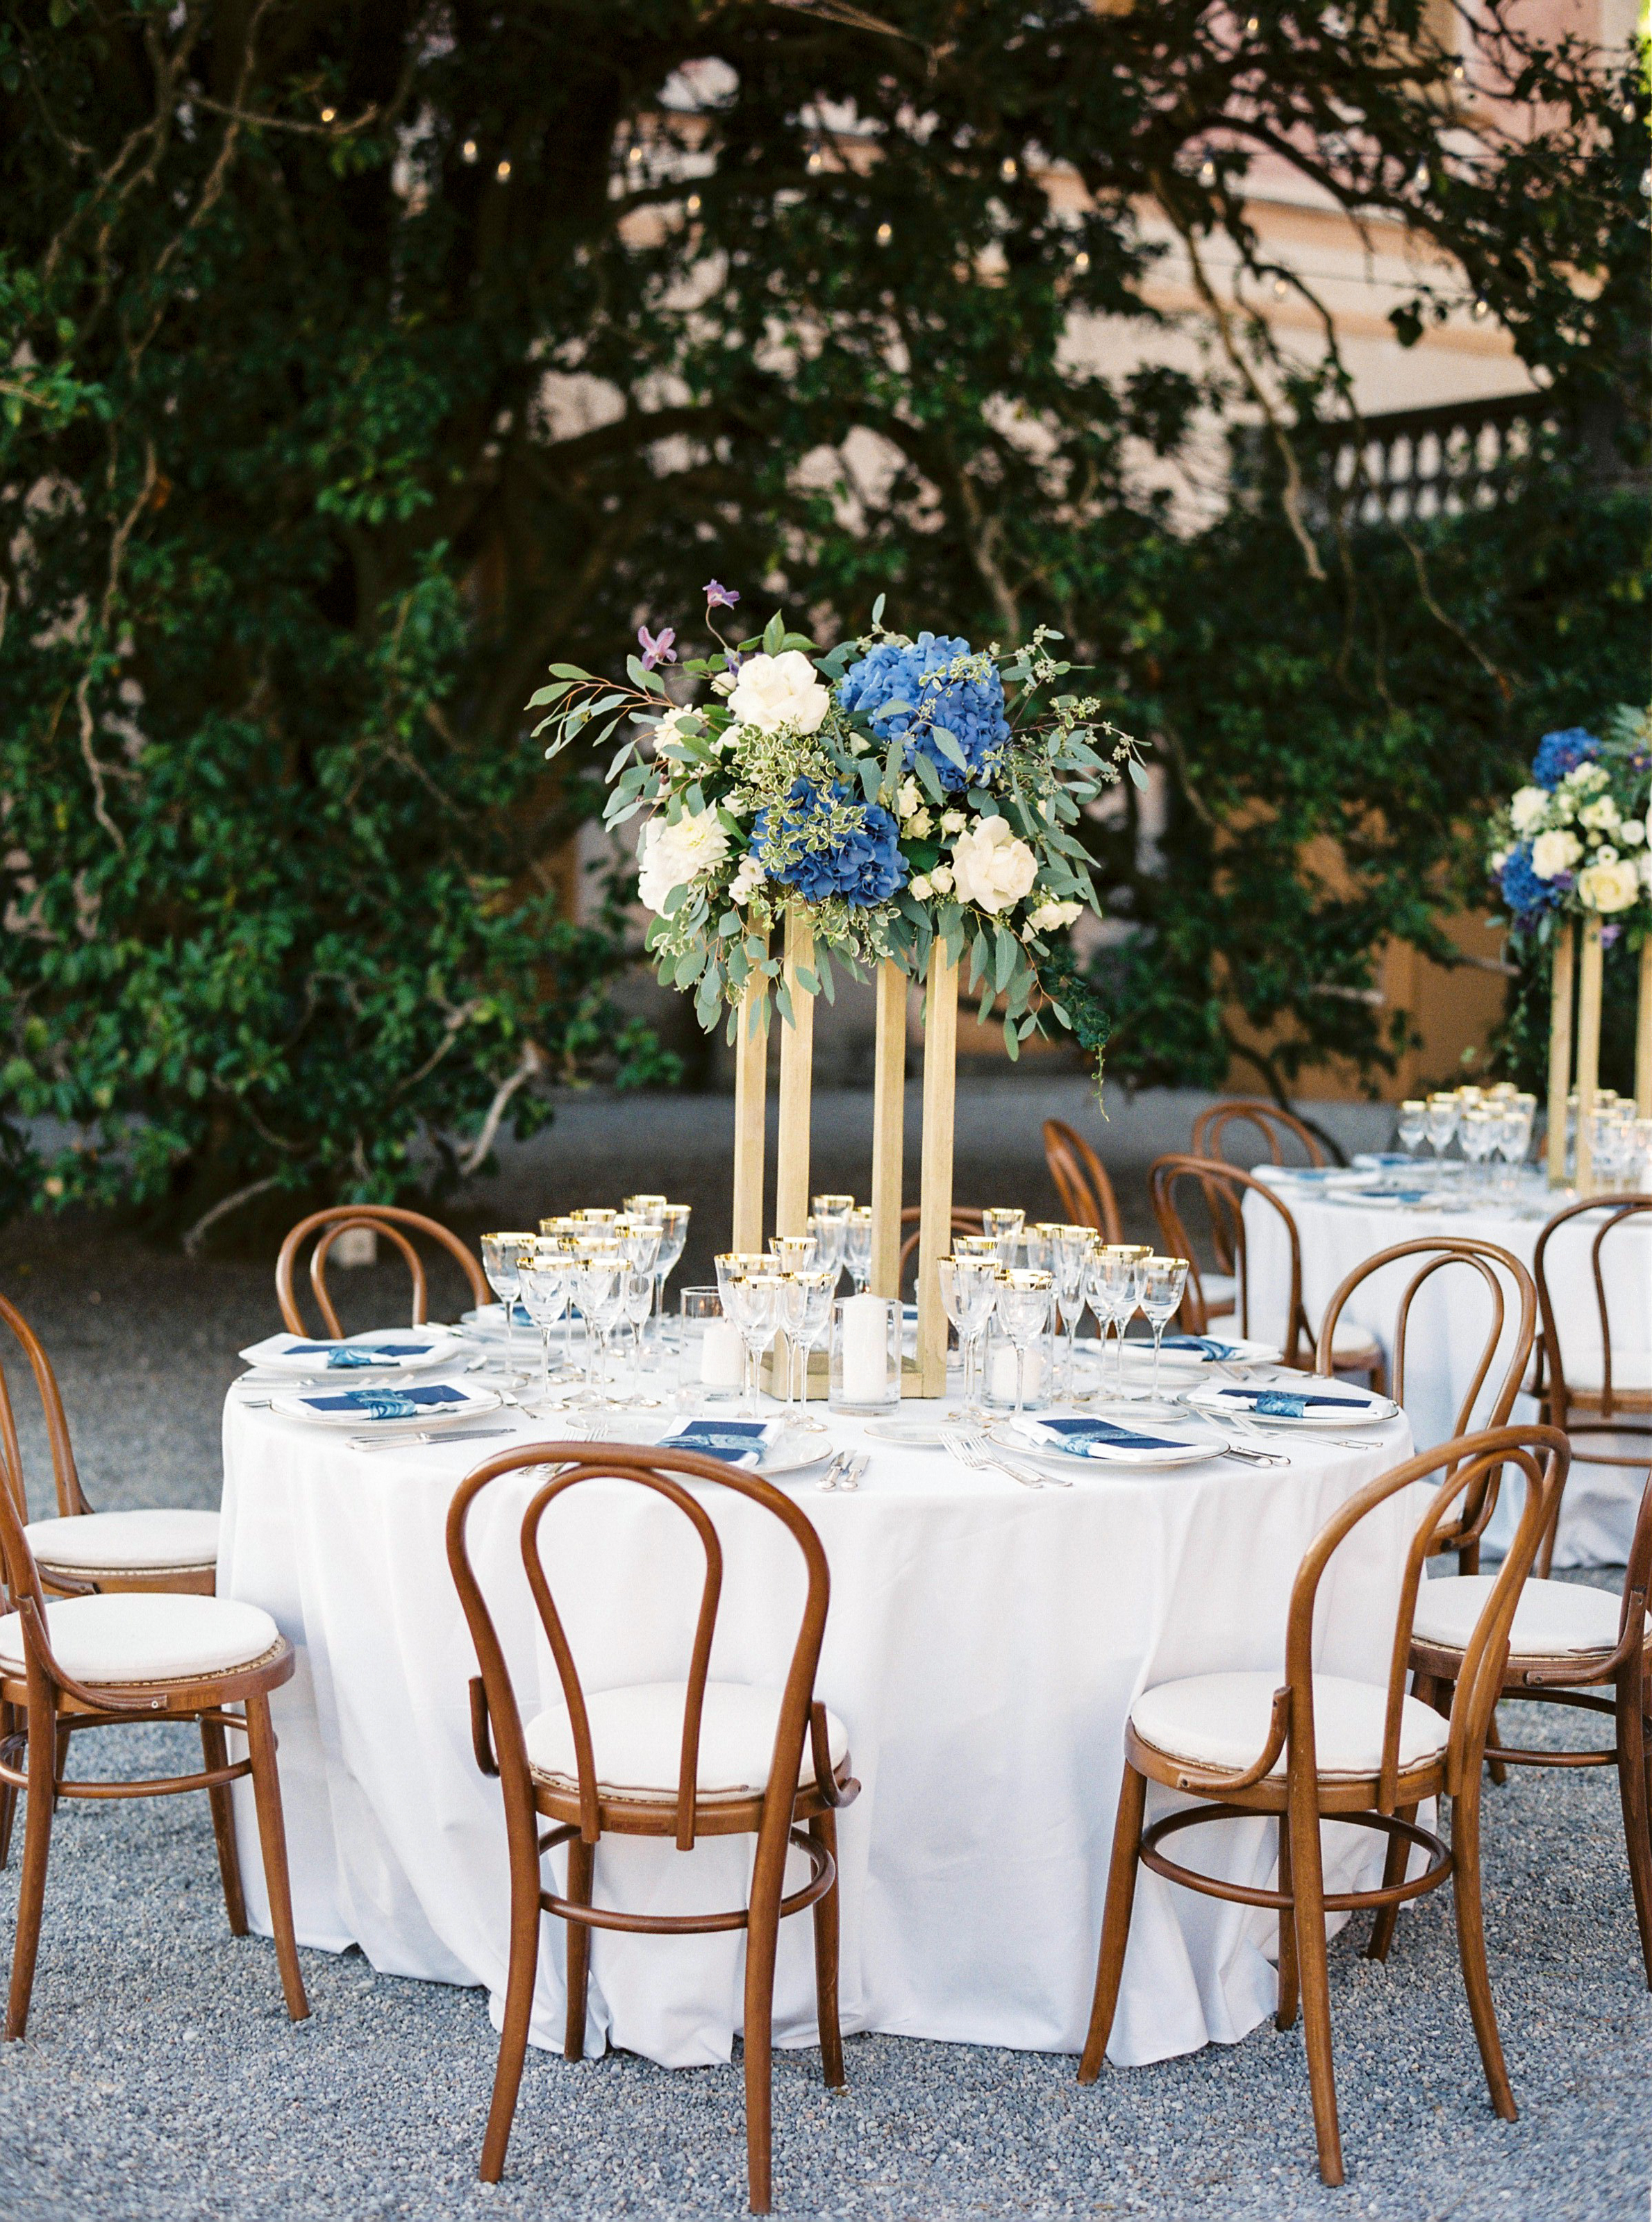 2 BridesPhotography_Molimenti_Wedding_55